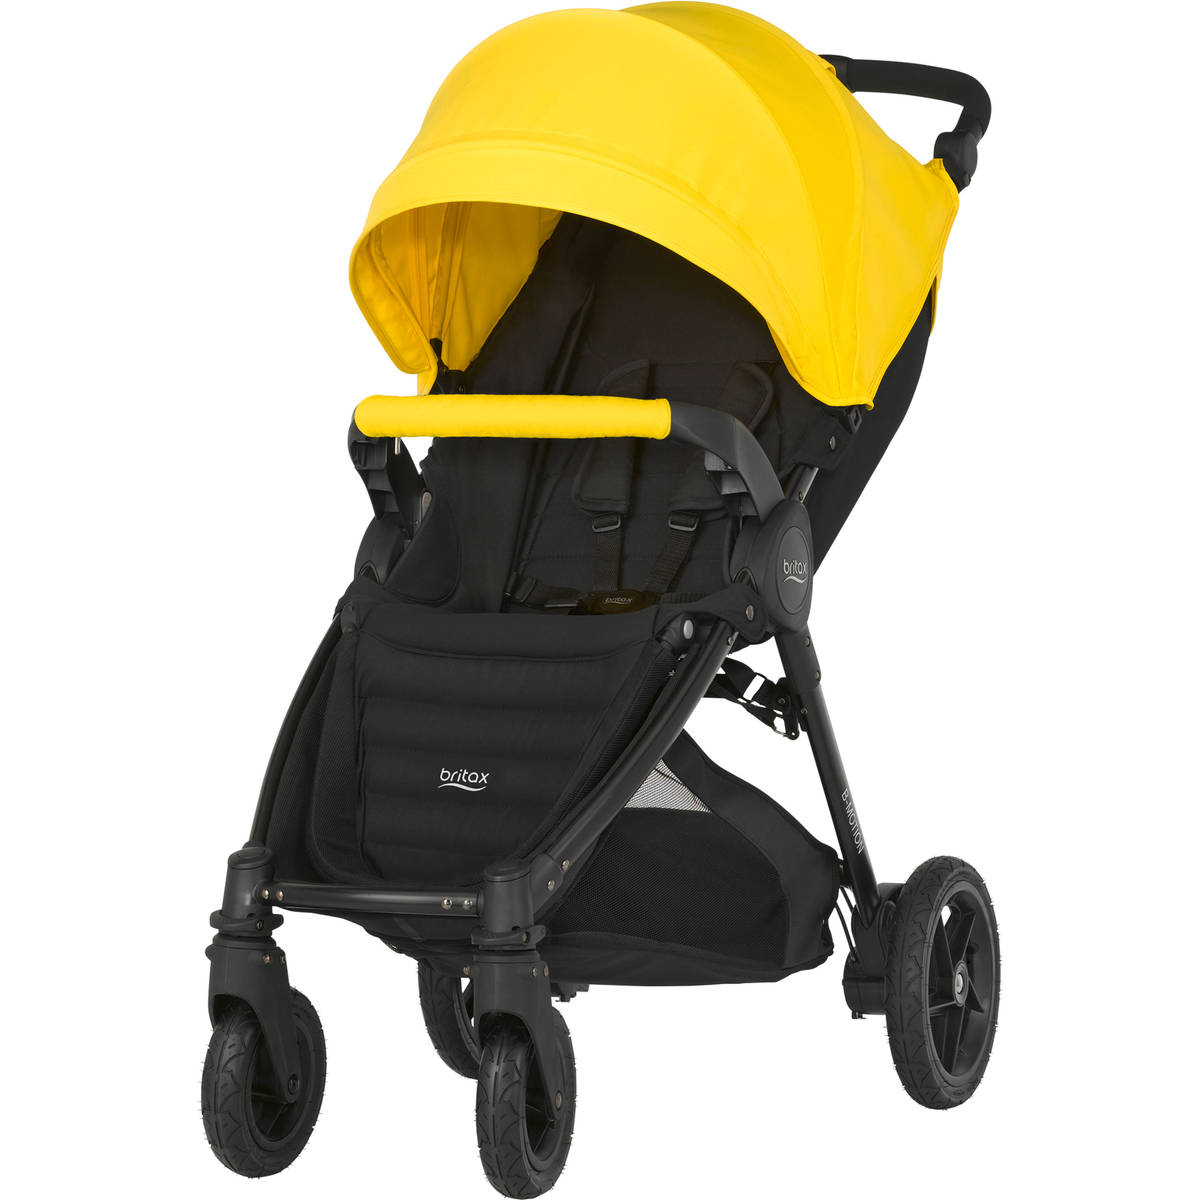 Sunshine Yellow - Matkarattaat - 3633320012 - 19